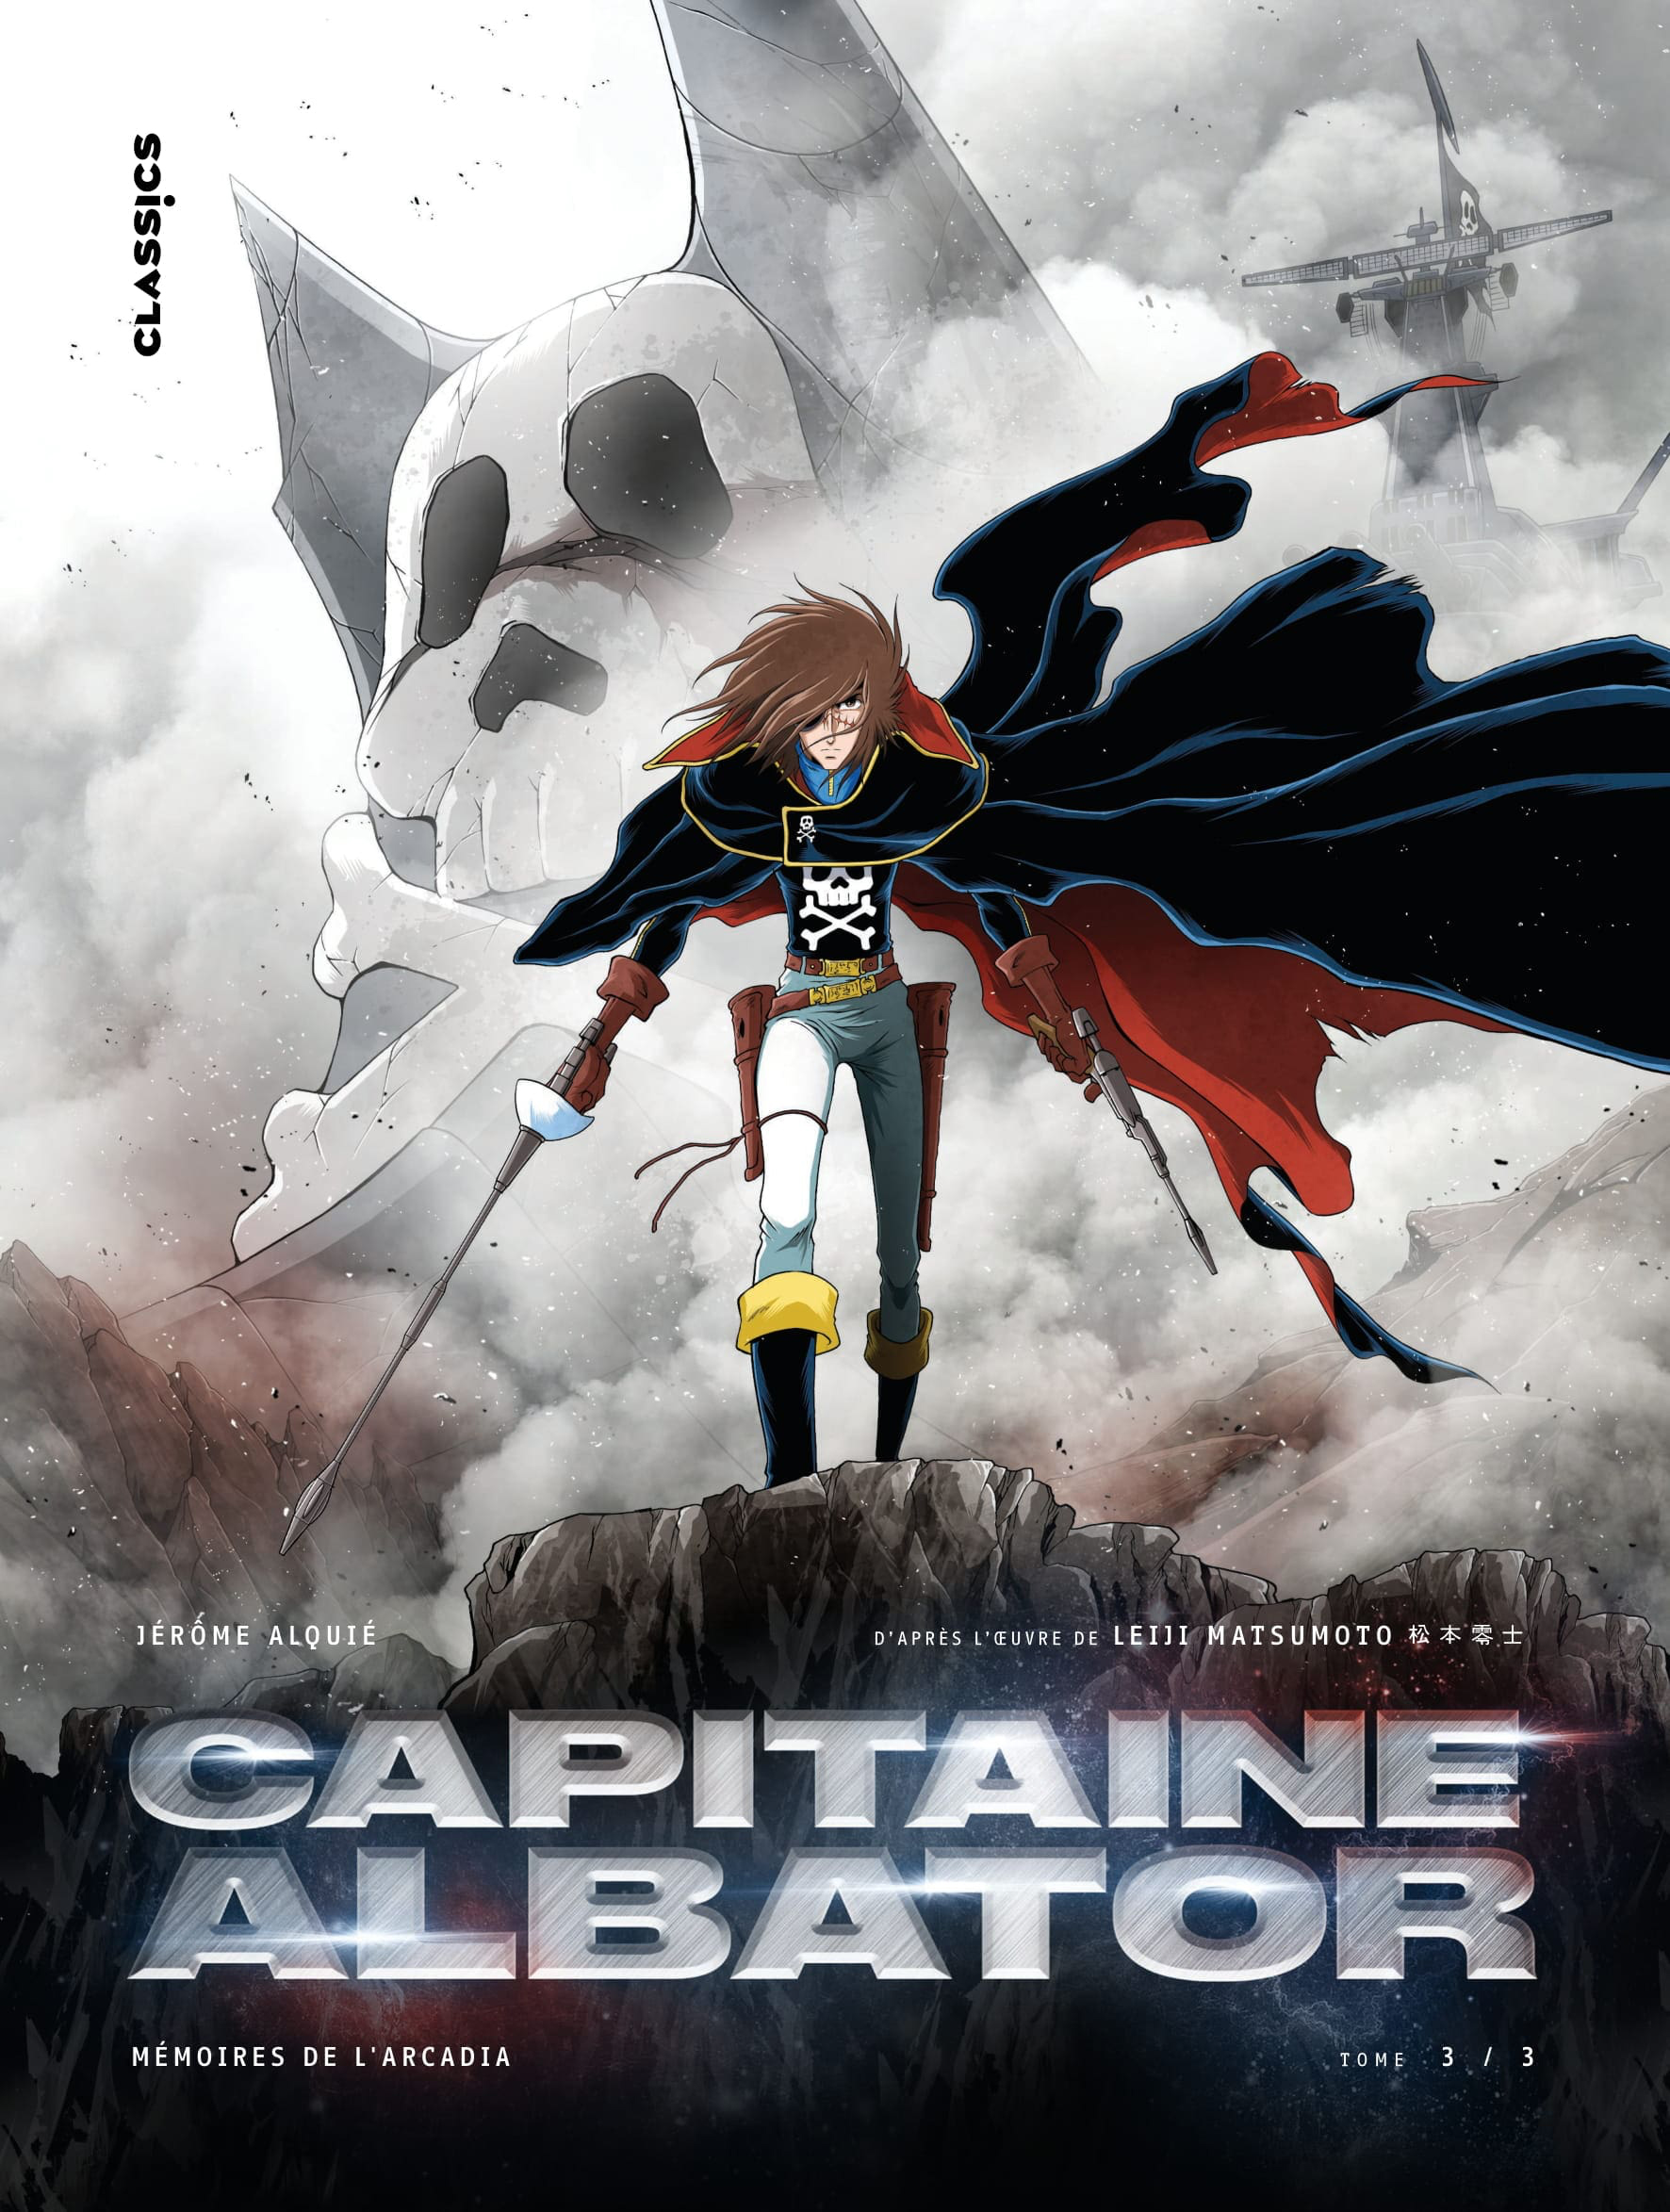 Capitaine Albator Mémoires de l'Arcadia tome 3